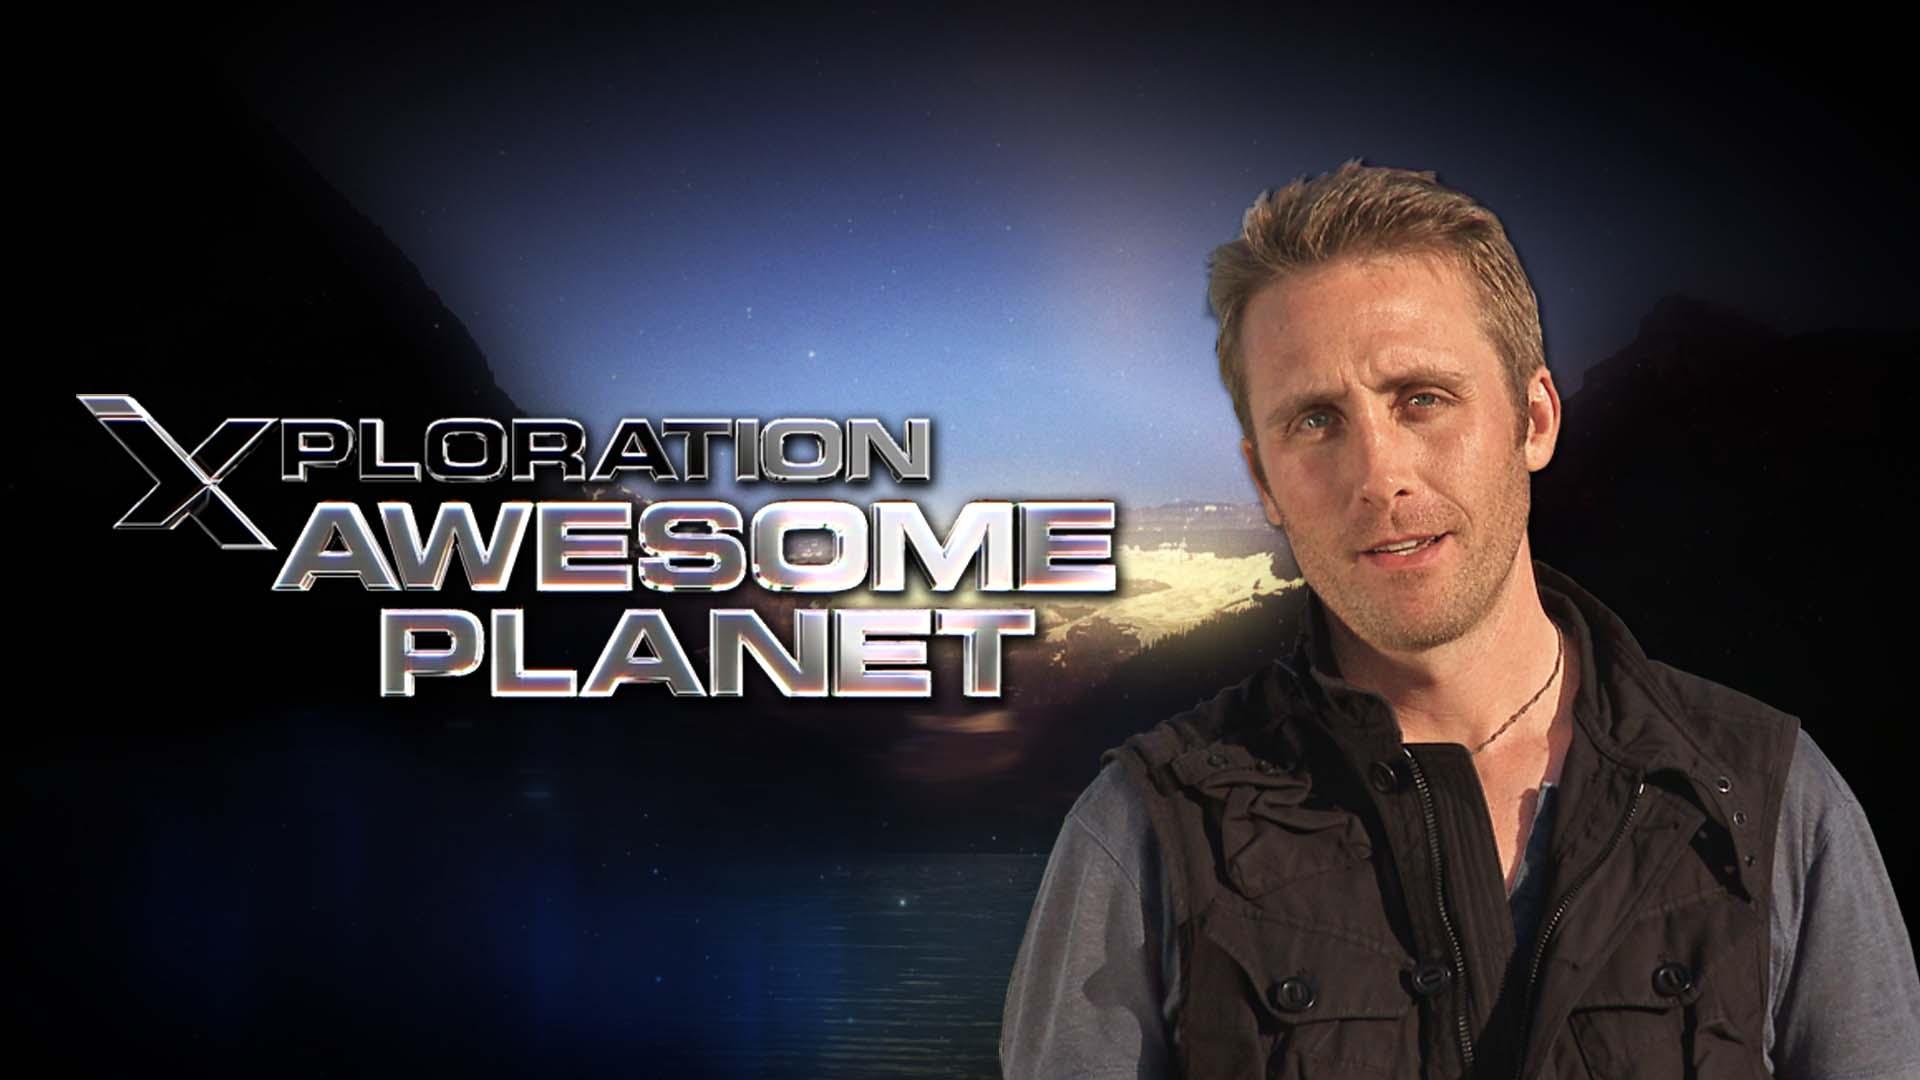 Xploration Awesome Planet -